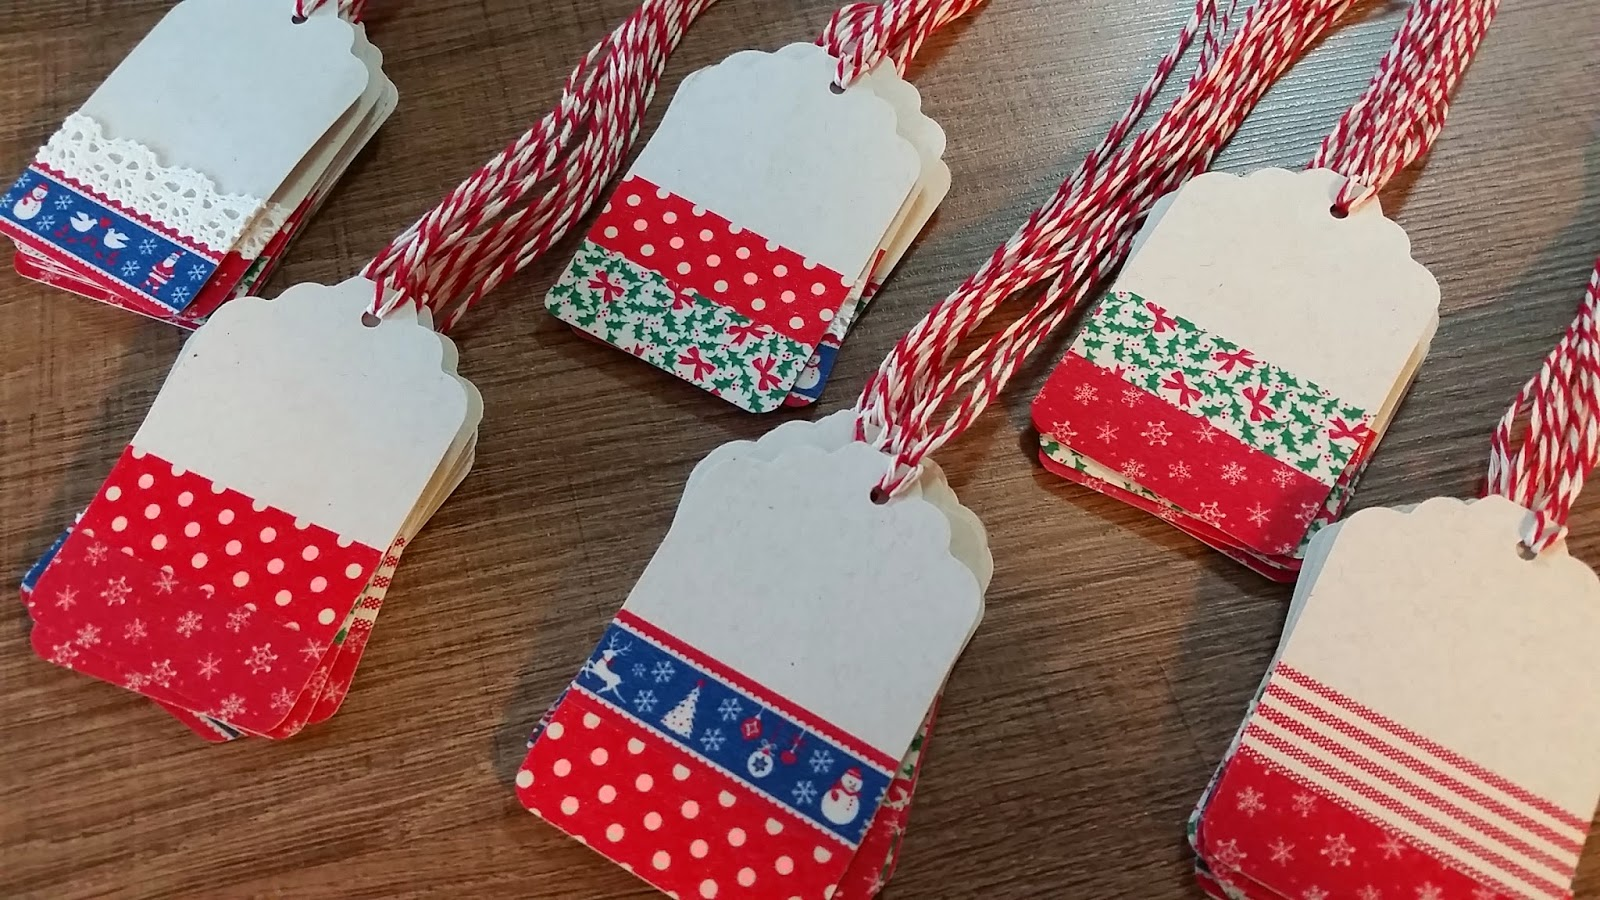 Artesanal Ou Artesanato ~ Rosa Pimenta Tags artesanais para fazer bonito neste Natal!